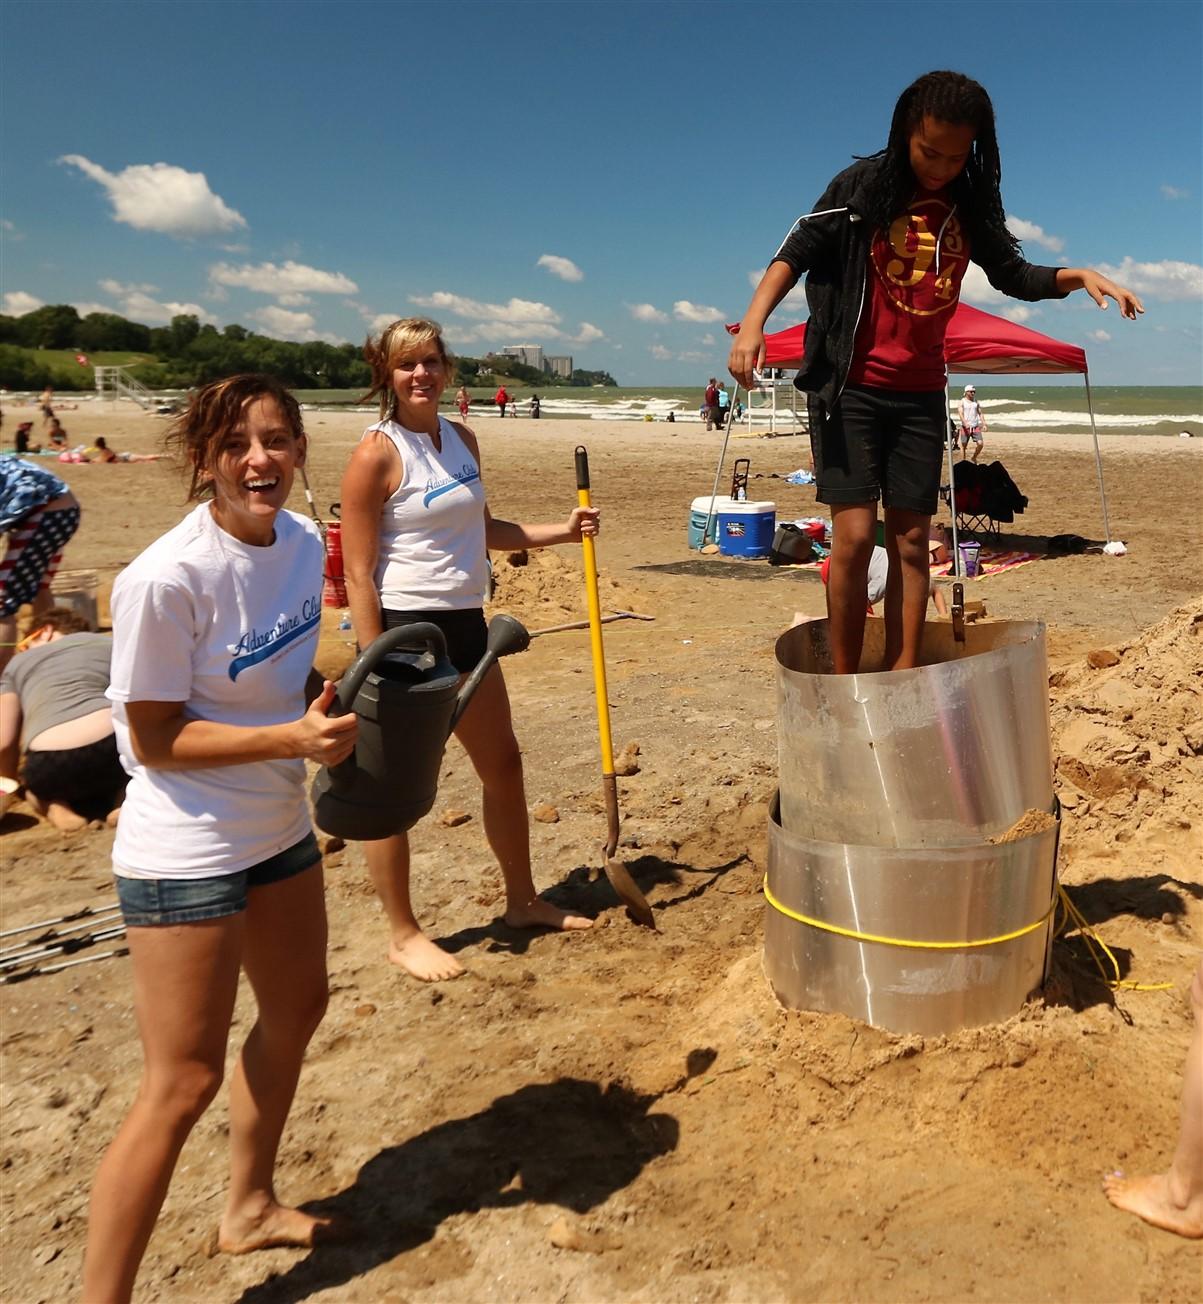 2017 08 05 219 Cleveland Edgewater Beach Day.jpg